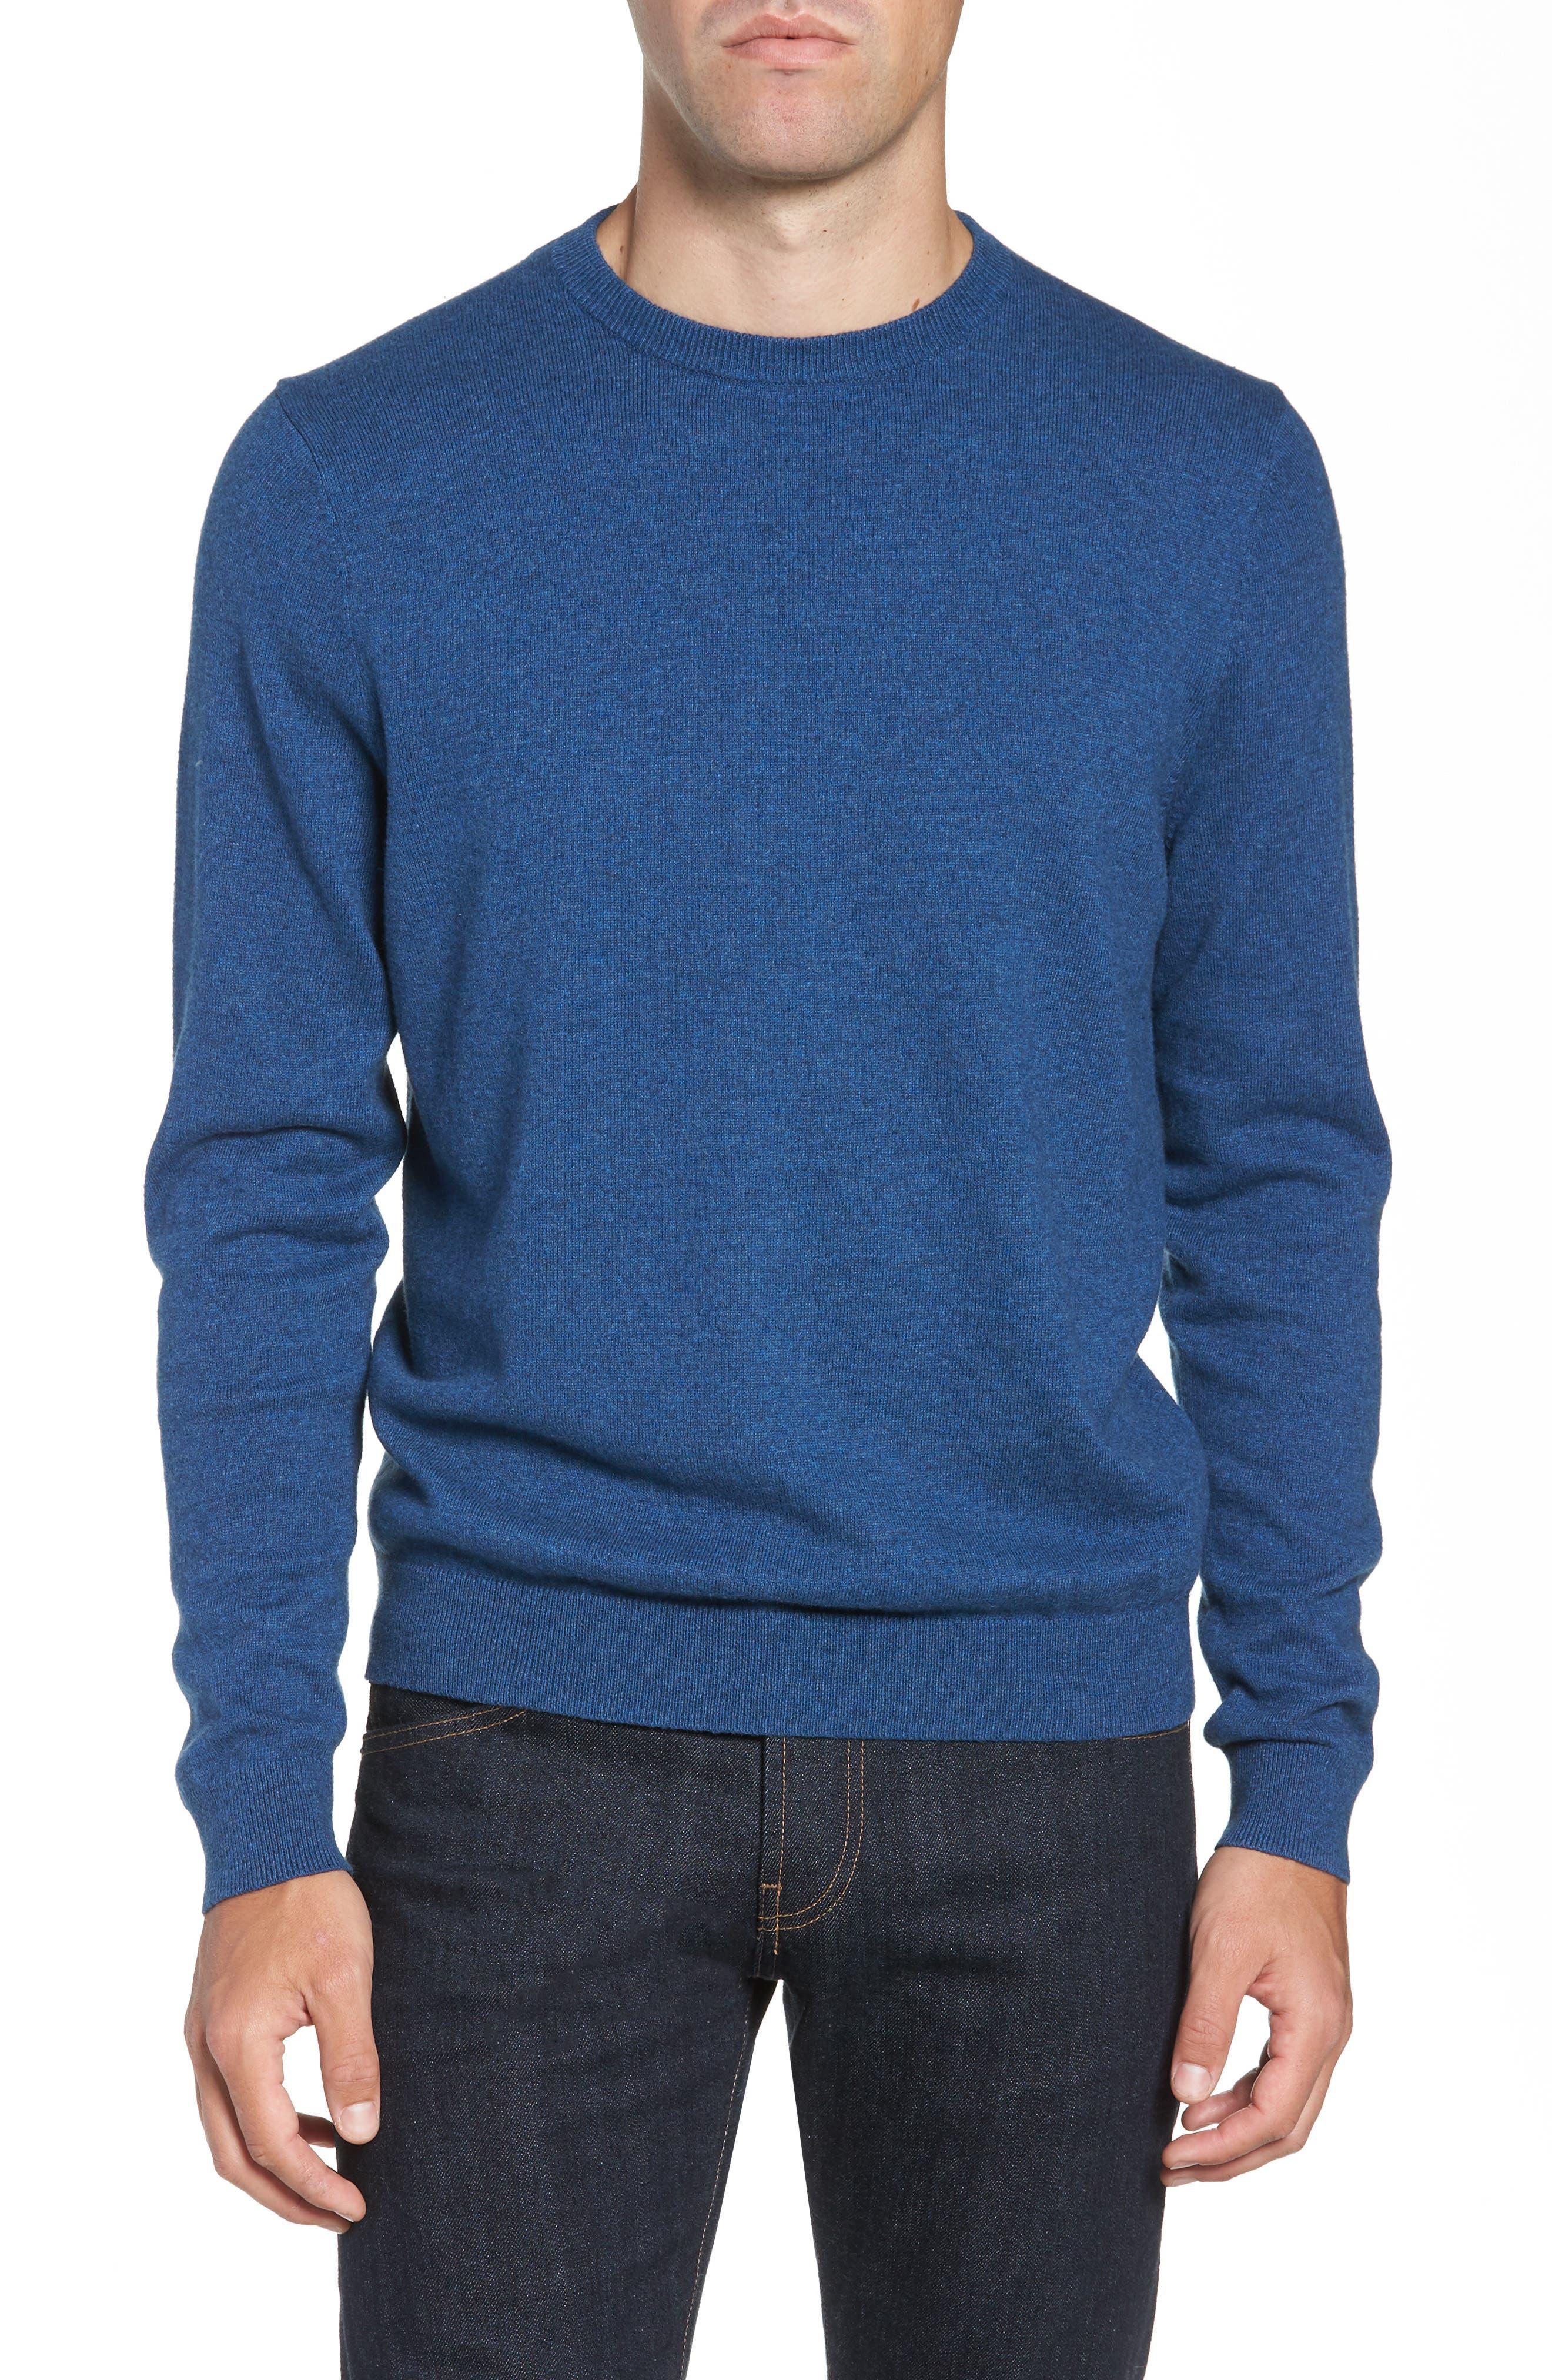 Blue Men's Sweater